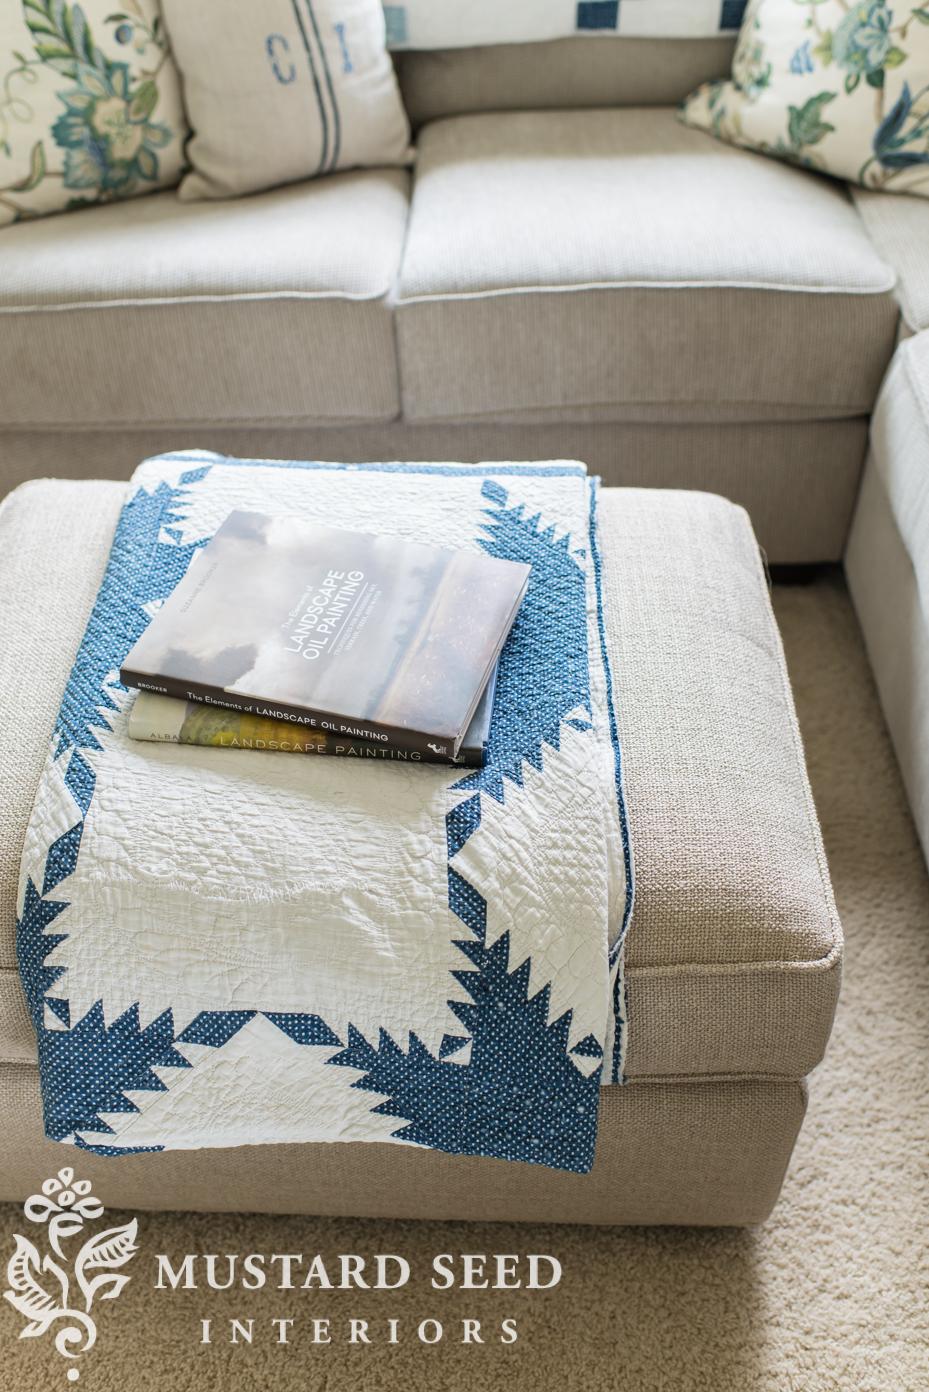 Tremendous Finishing Touches 500 Arhaus Giveaway Miss Mustard Seed Inzonedesignstudio Interior Chair Design Inzonedesignstudiocom